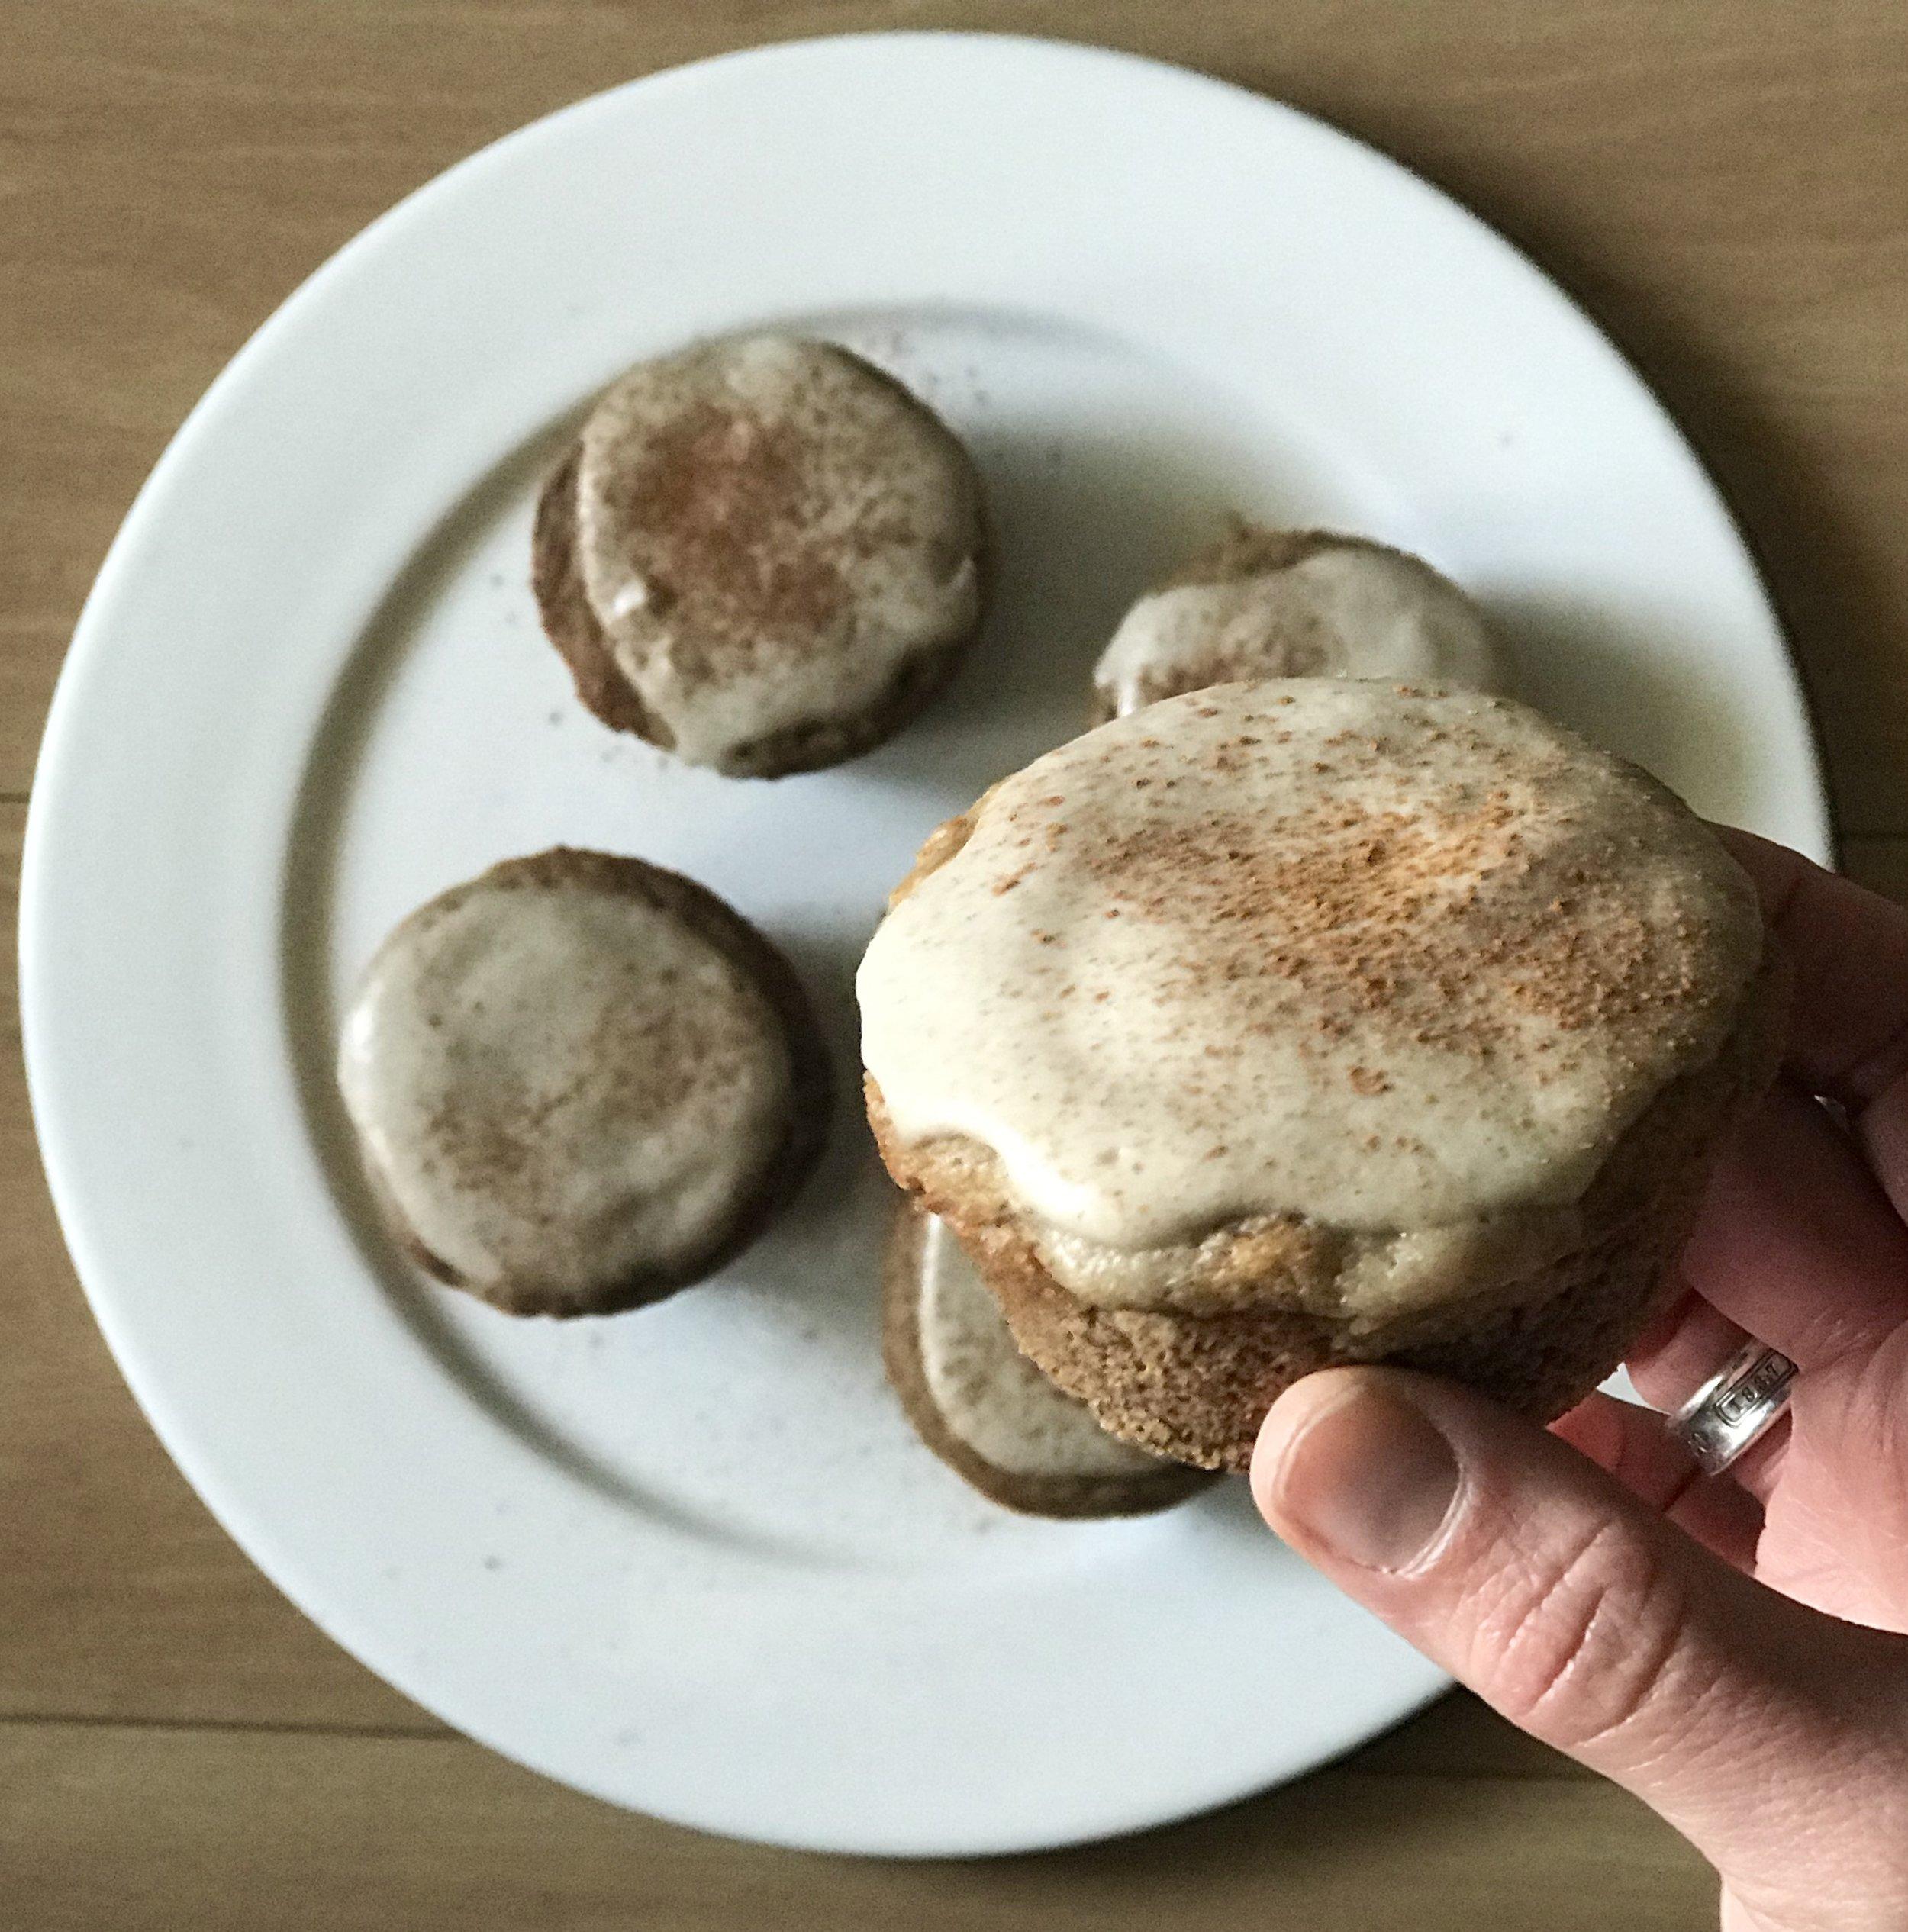 Cinnamon Roll muffins - www.JoyfulGoodness.com - #vegan #paleo #grainfree #breakfast #beJoyful #cinnamonrolls